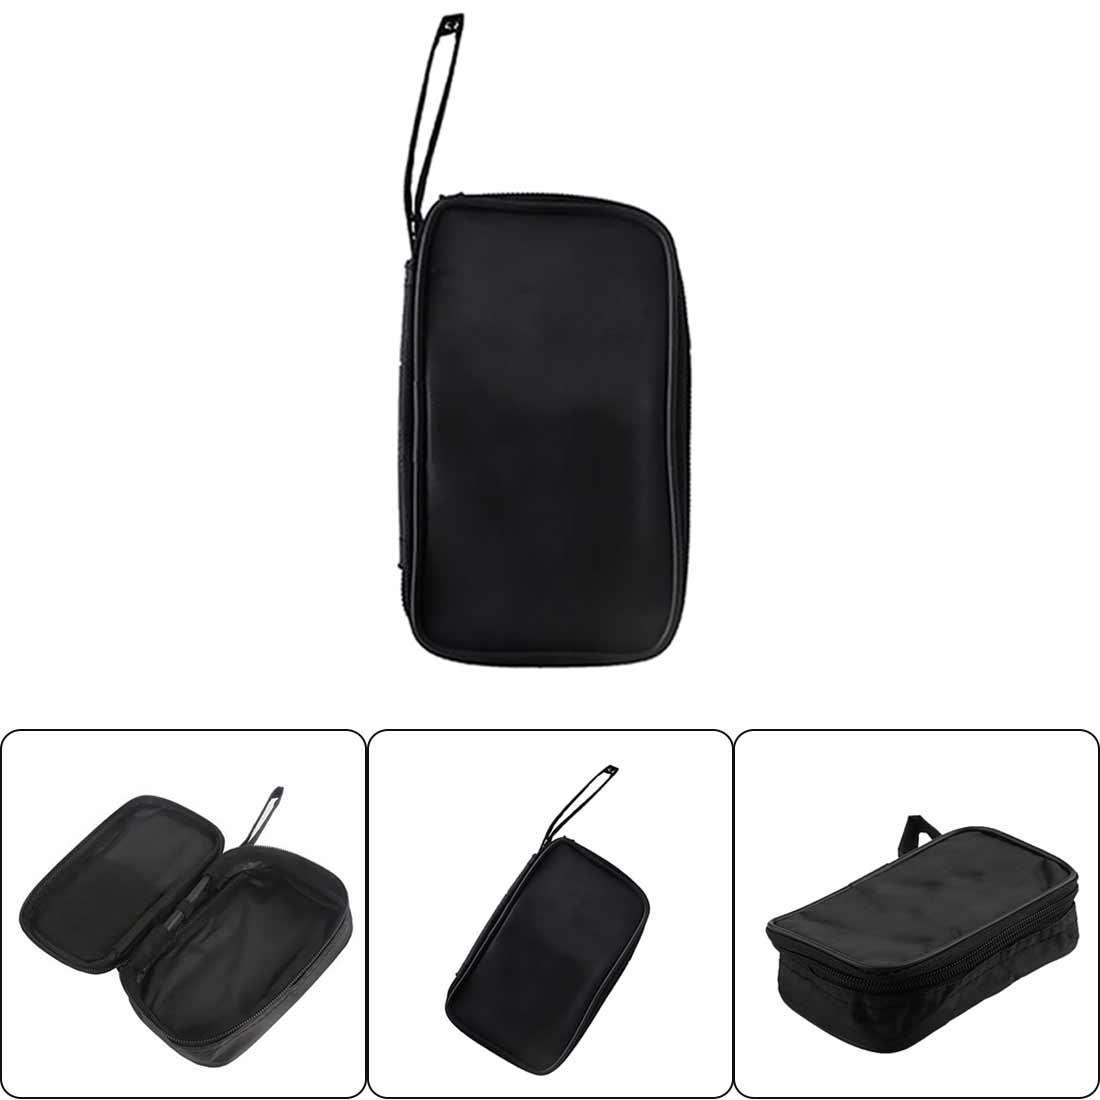 Multimeter Black Canvas Bag For UT61 Series Digital Multimeter Cloth Durable Waterproof Tools Bag 23x14x5cm